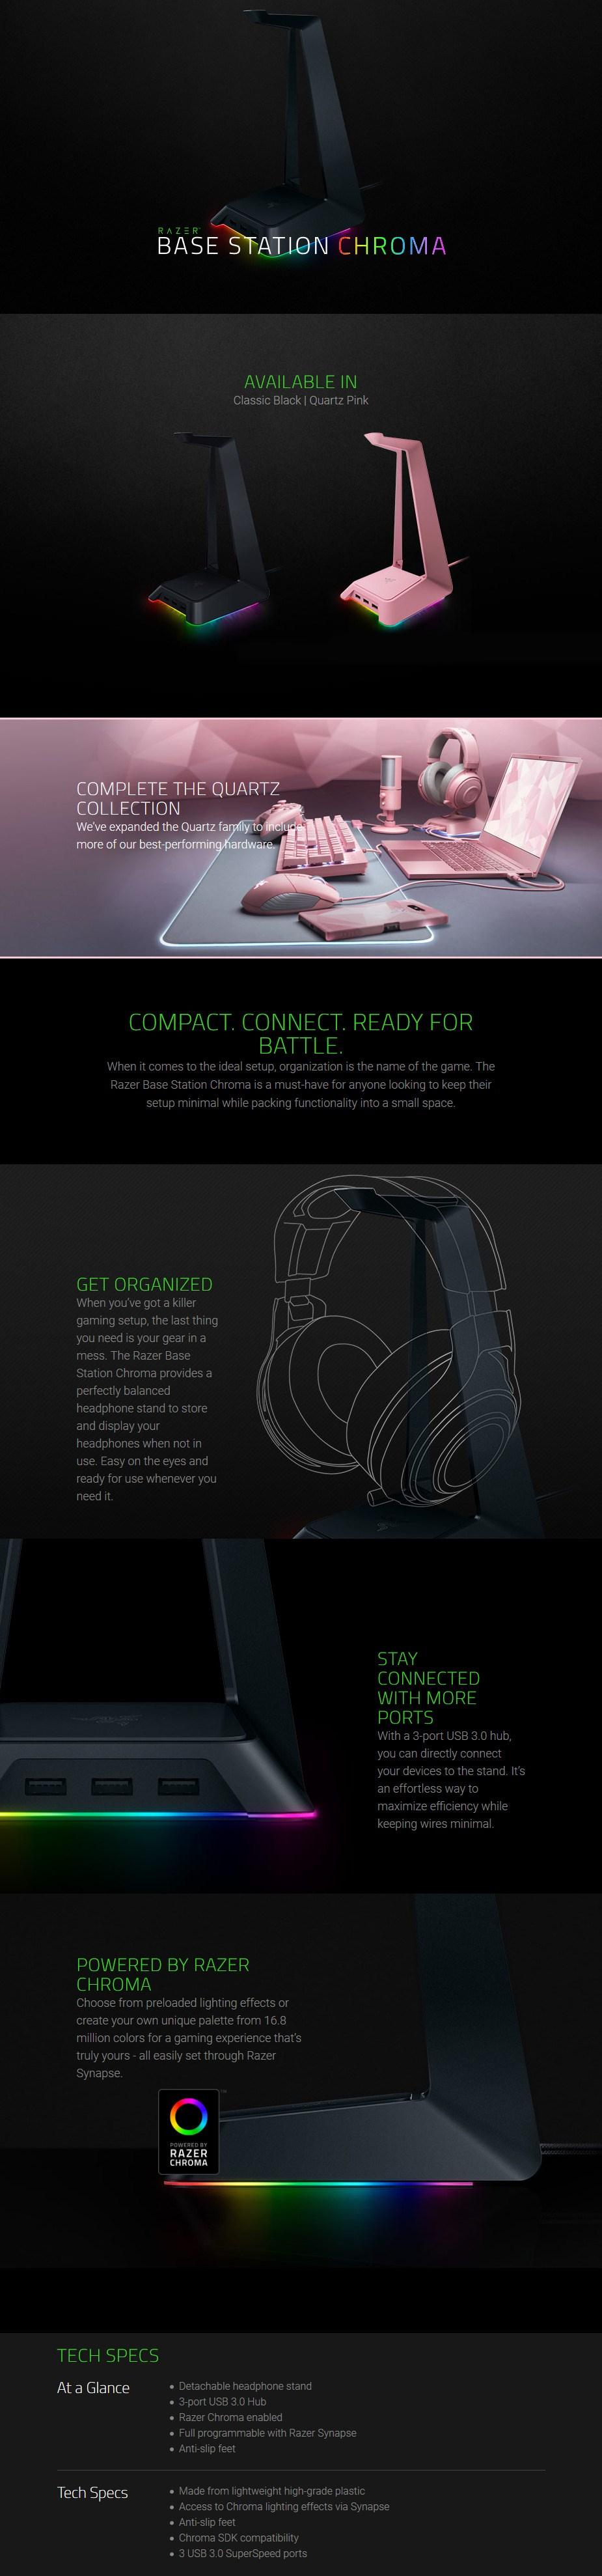 Razer Chroma Headset Stand & Base Station - Desktop Overview 1